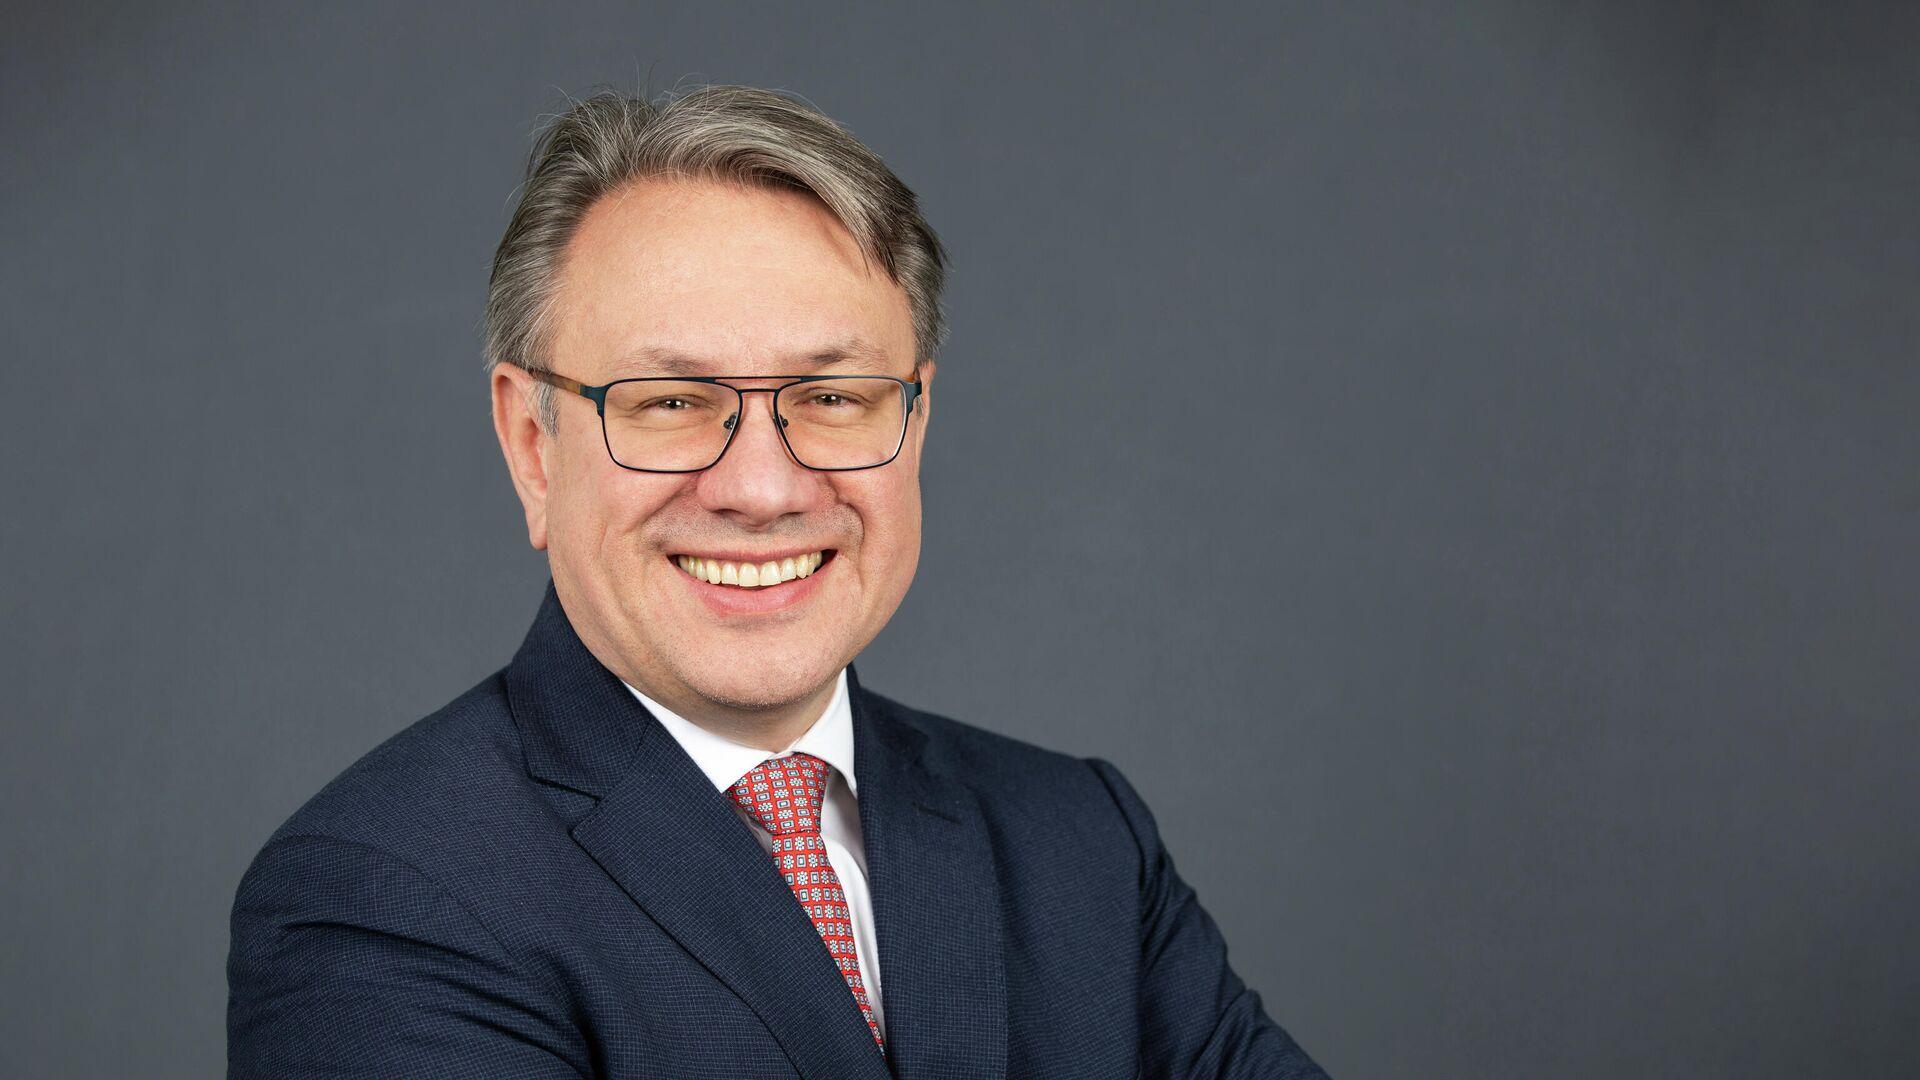 Georg Nüßlein (Archiv) - SNA, 1920, 25.02.2021